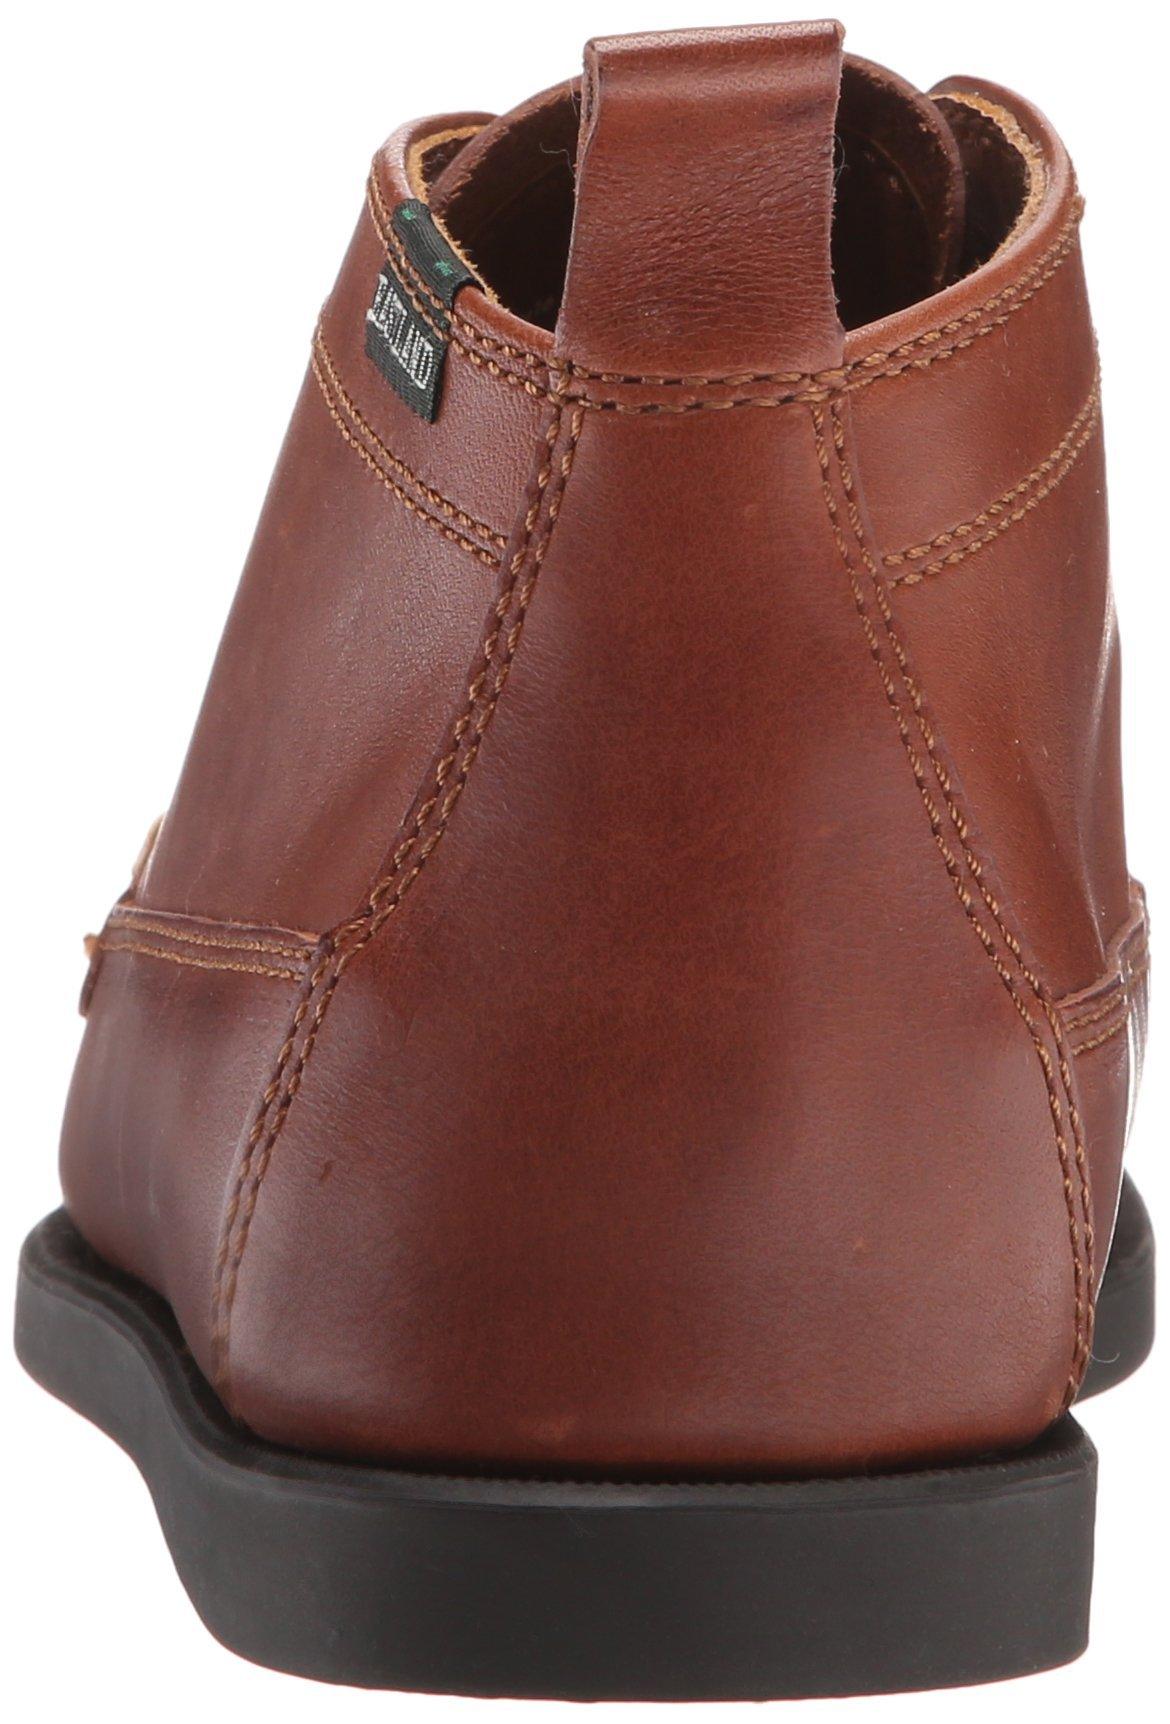 Eastland Men's Seneca Chukka Boot, Tan, 14 W US by Eastland (Image #2)